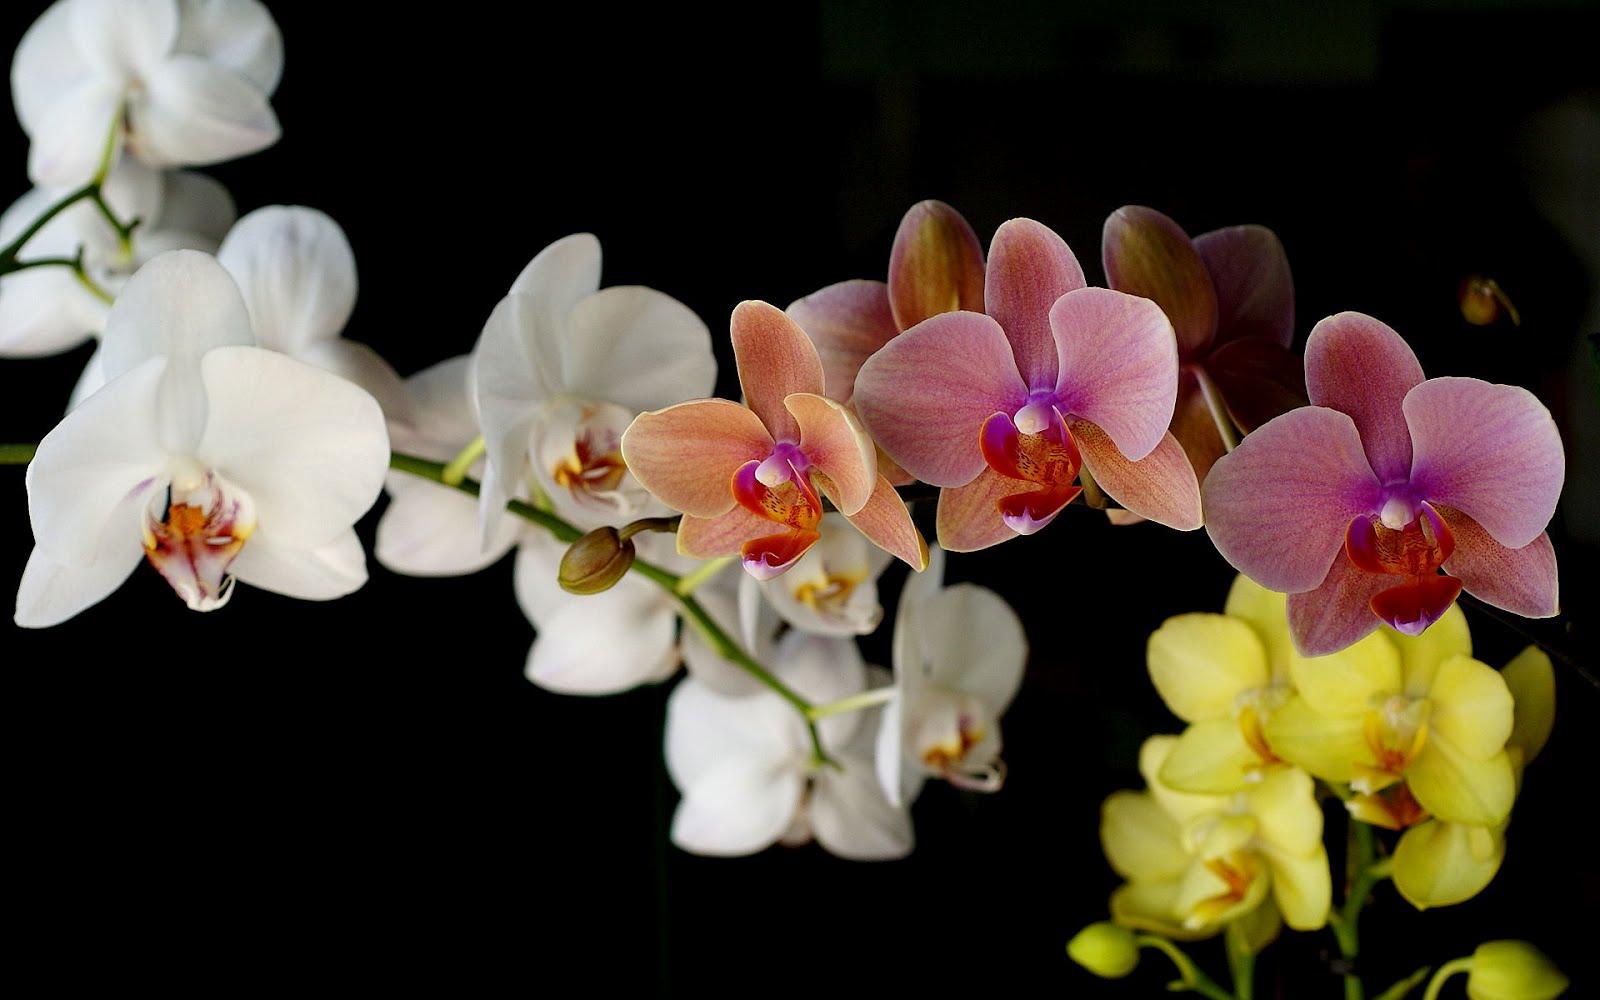 http://1.bp.blogspot.com/-EgJ2dfyCfVU/T361KFQ8bwI/AAAAAAAAFPg/JRxAPuXmupc/s1600/imagini_orhidee.jpg